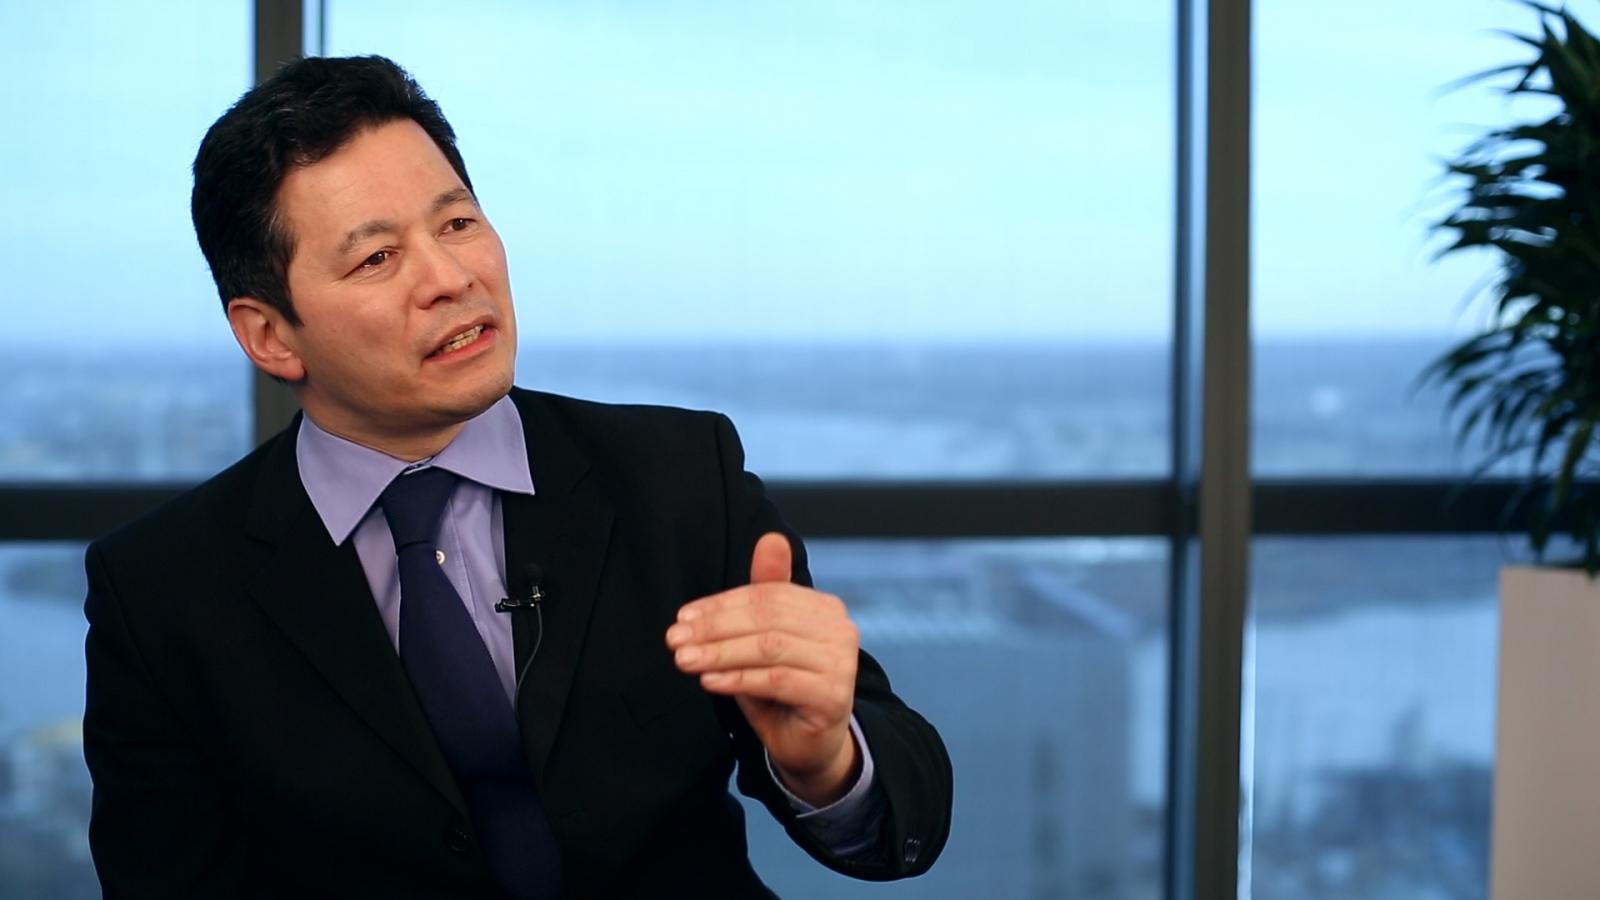 Edmund Shing: Barratt, Berkeley and Taylor Wimpey safe bets for building returns